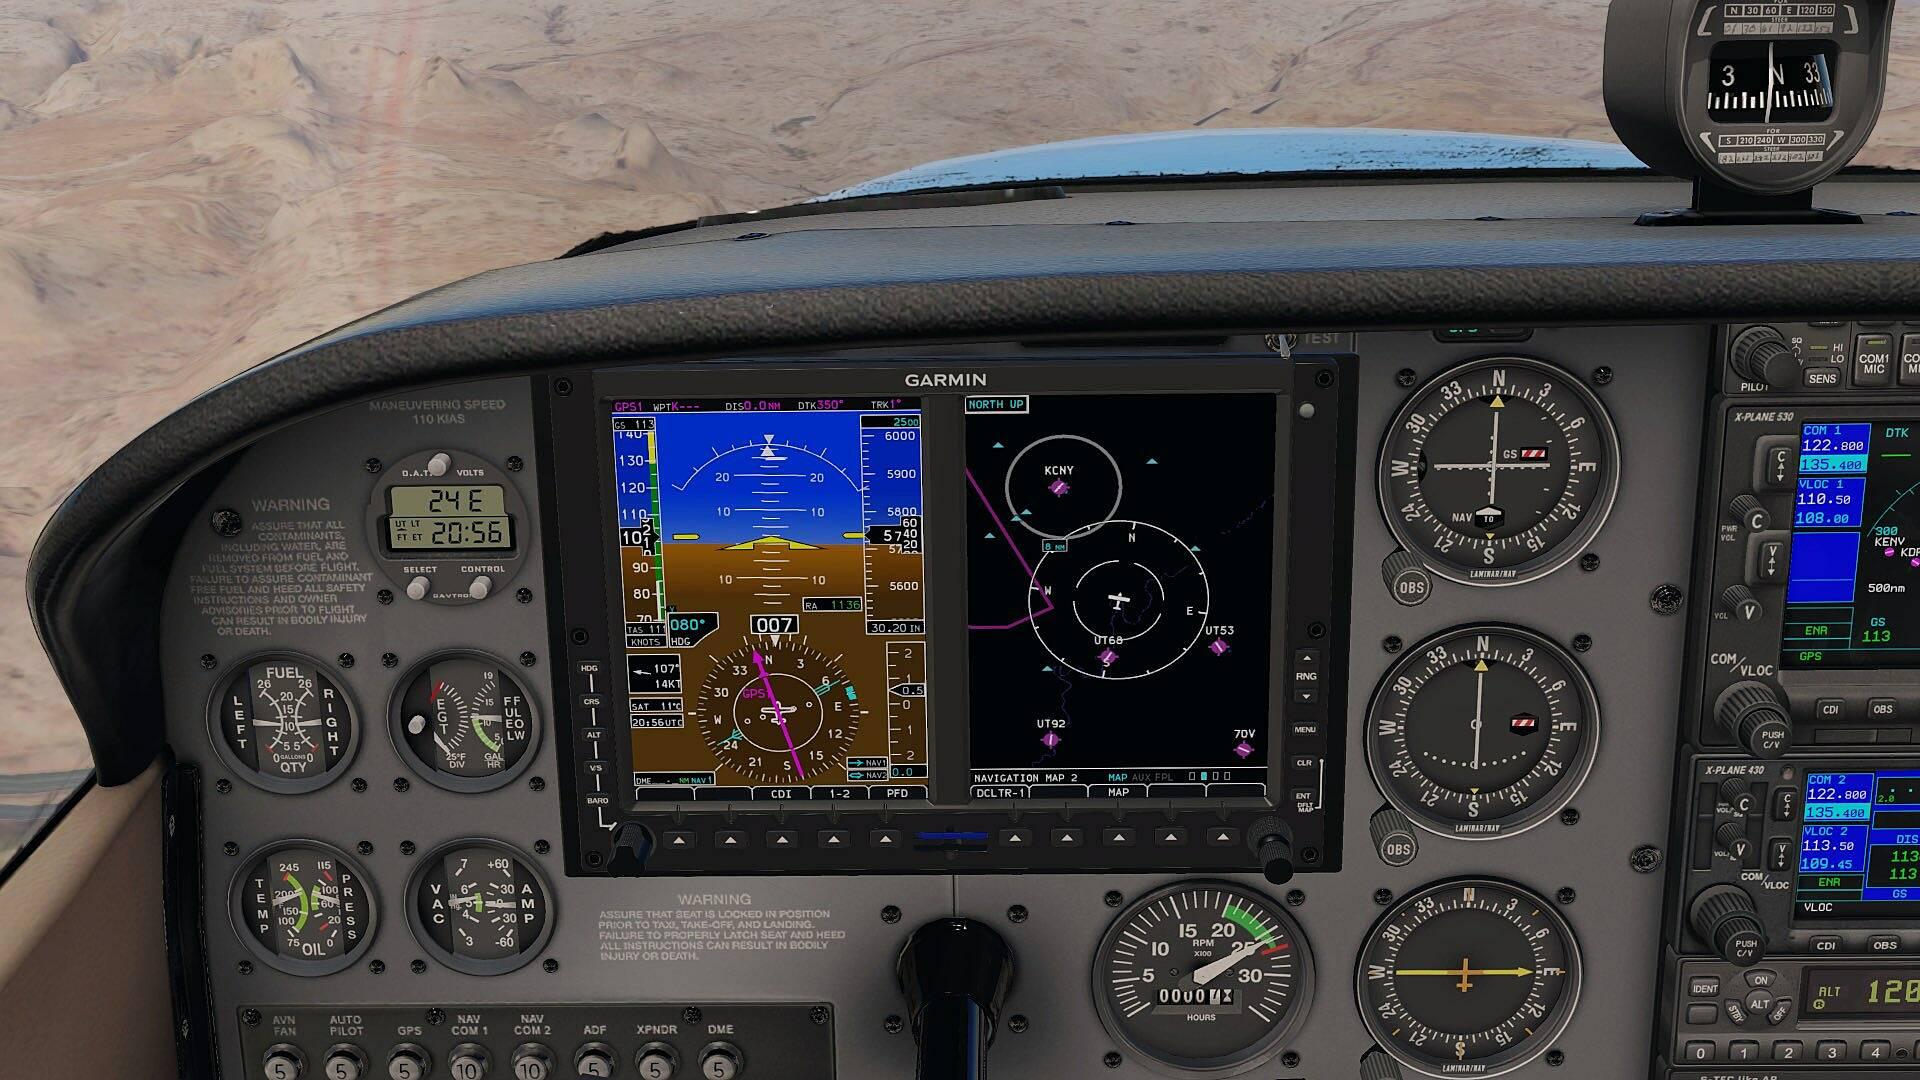 Cessna_172SP_G500 - 2021-08-20 01.00.17.jpg